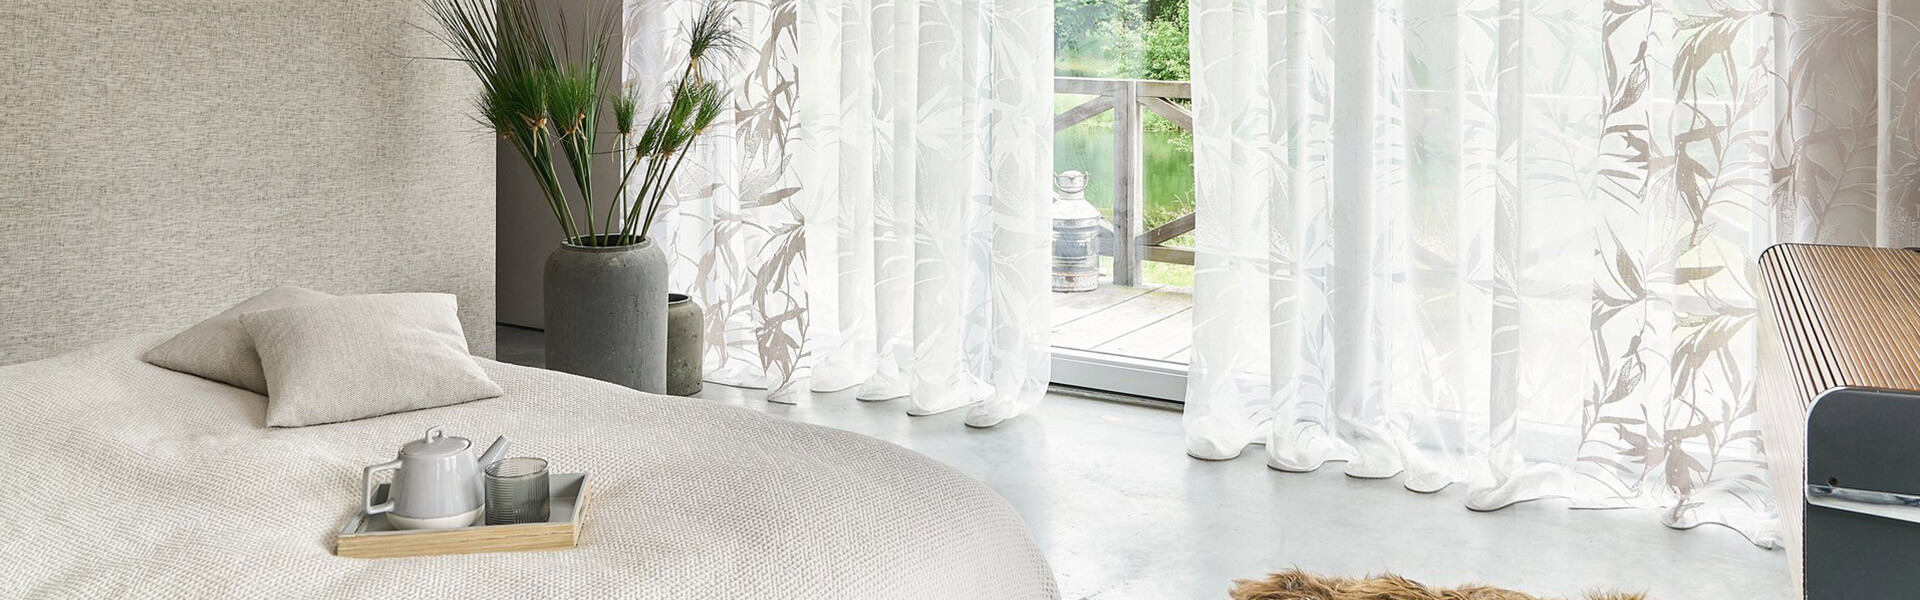 raumausstatter berlin beese raumgestaltung. Black Bedroom Furniture Sets. Home Design Ideas